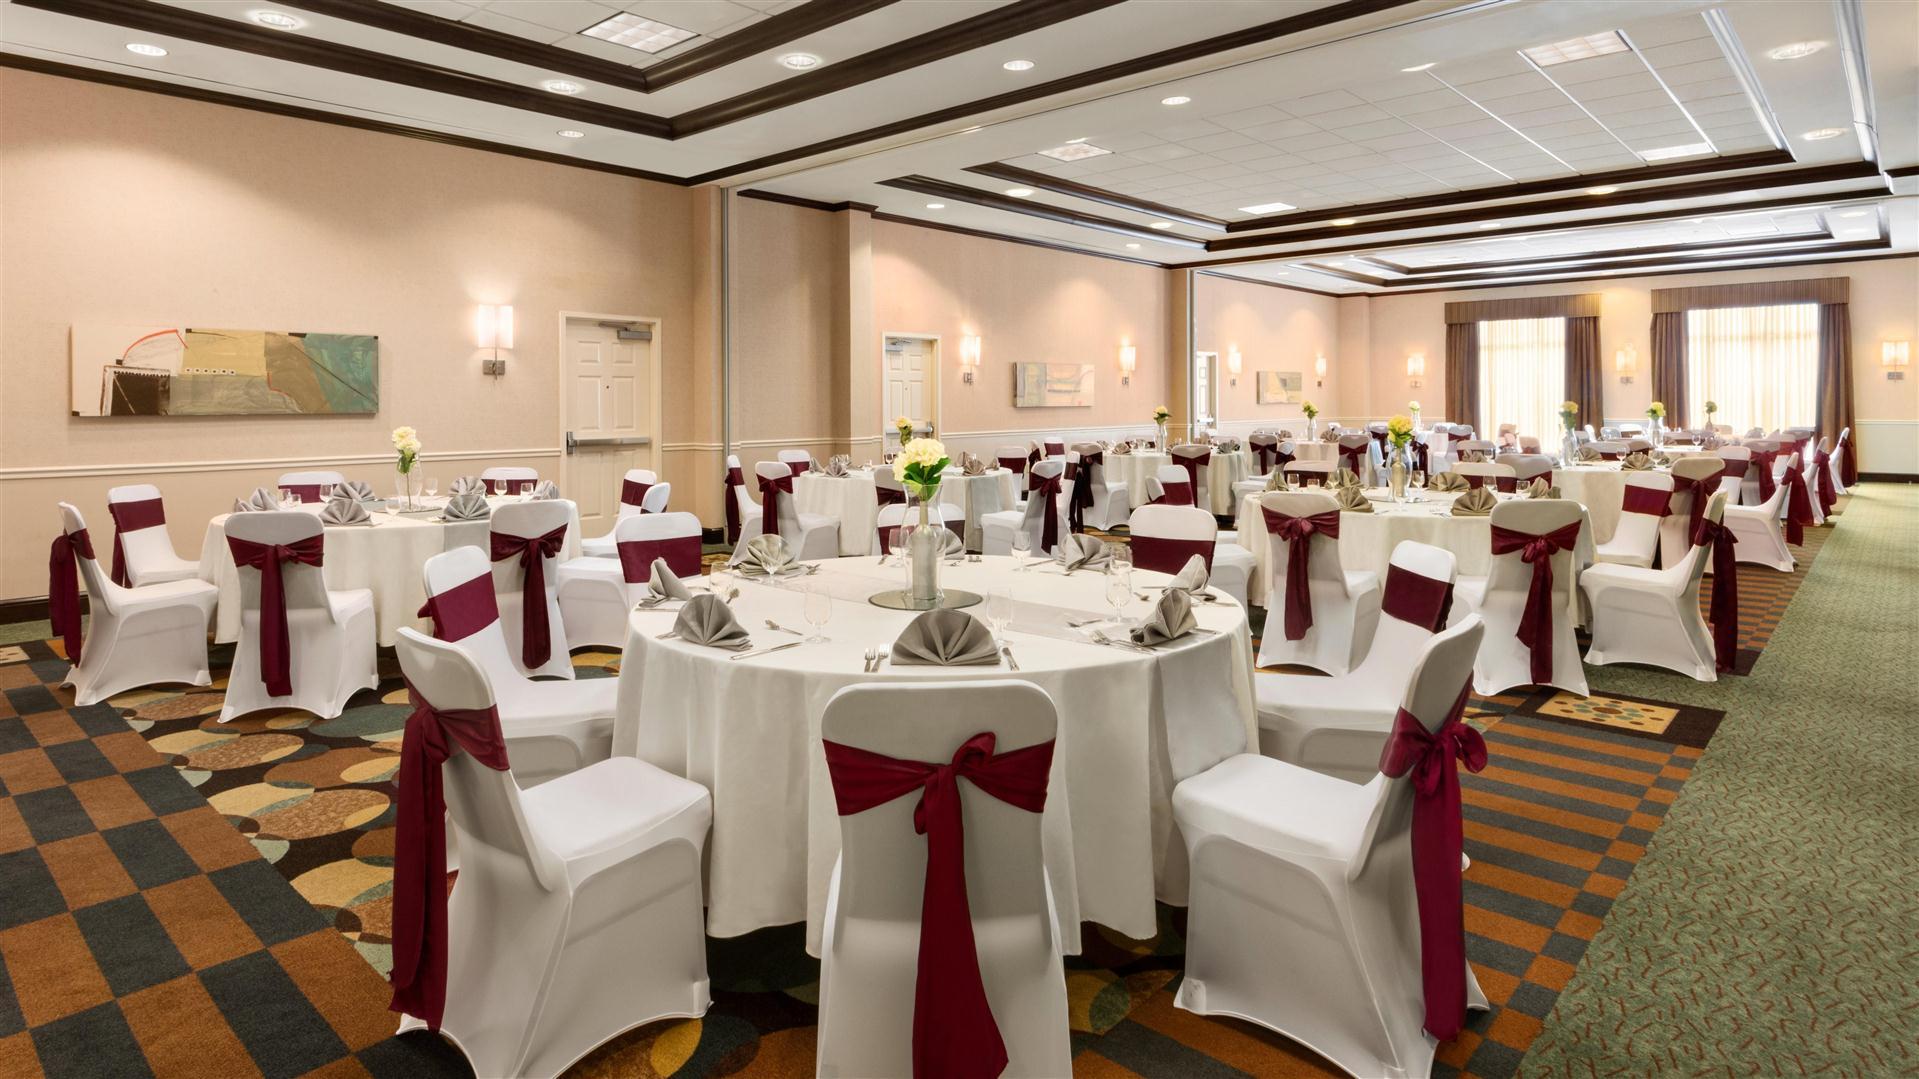 Meetings & Events at Hilton Garden Inn Dulles North Ashburn VA US